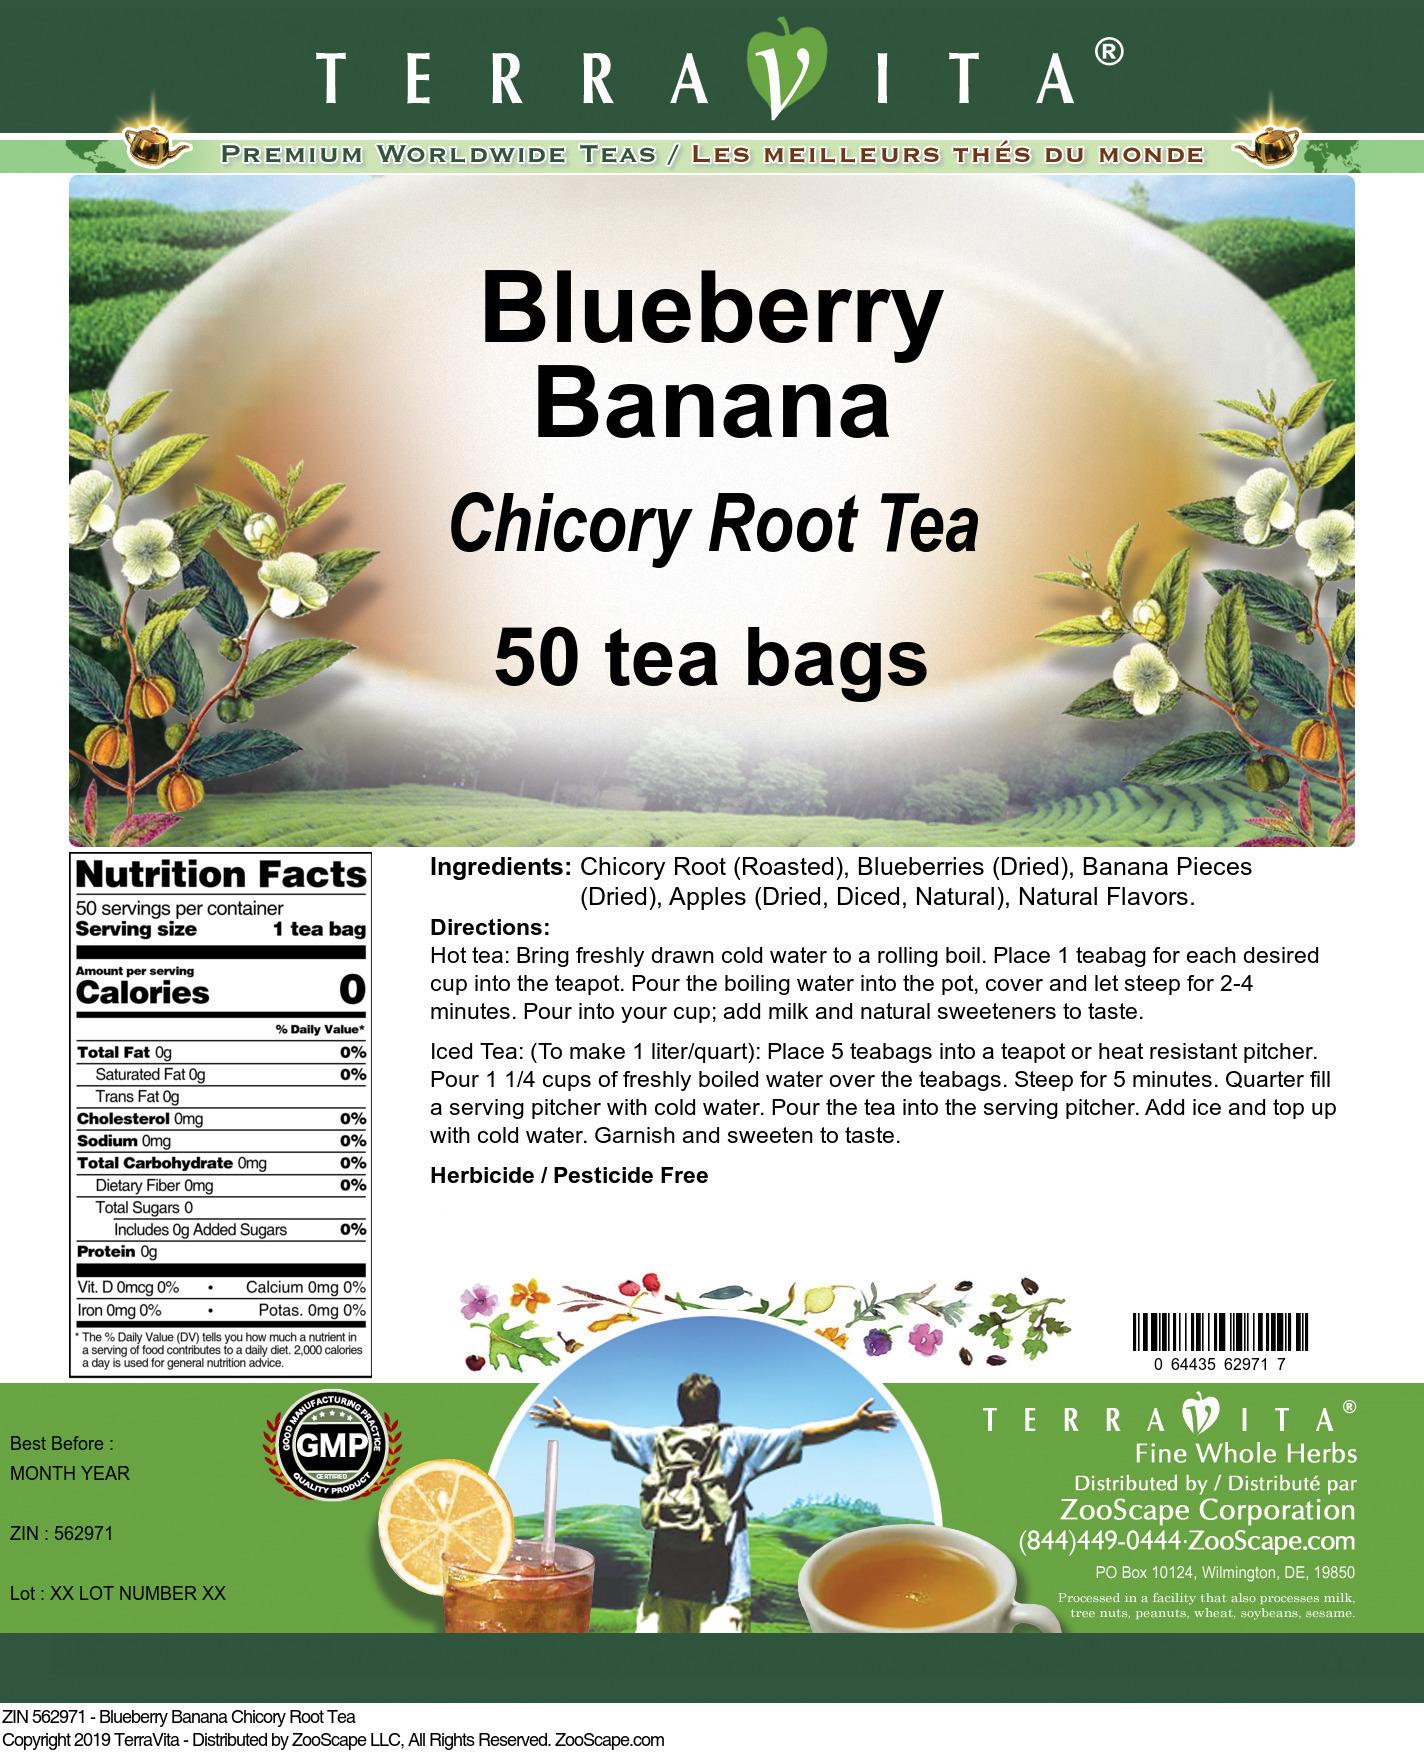 Blueberry Banana Chicory Root Tea